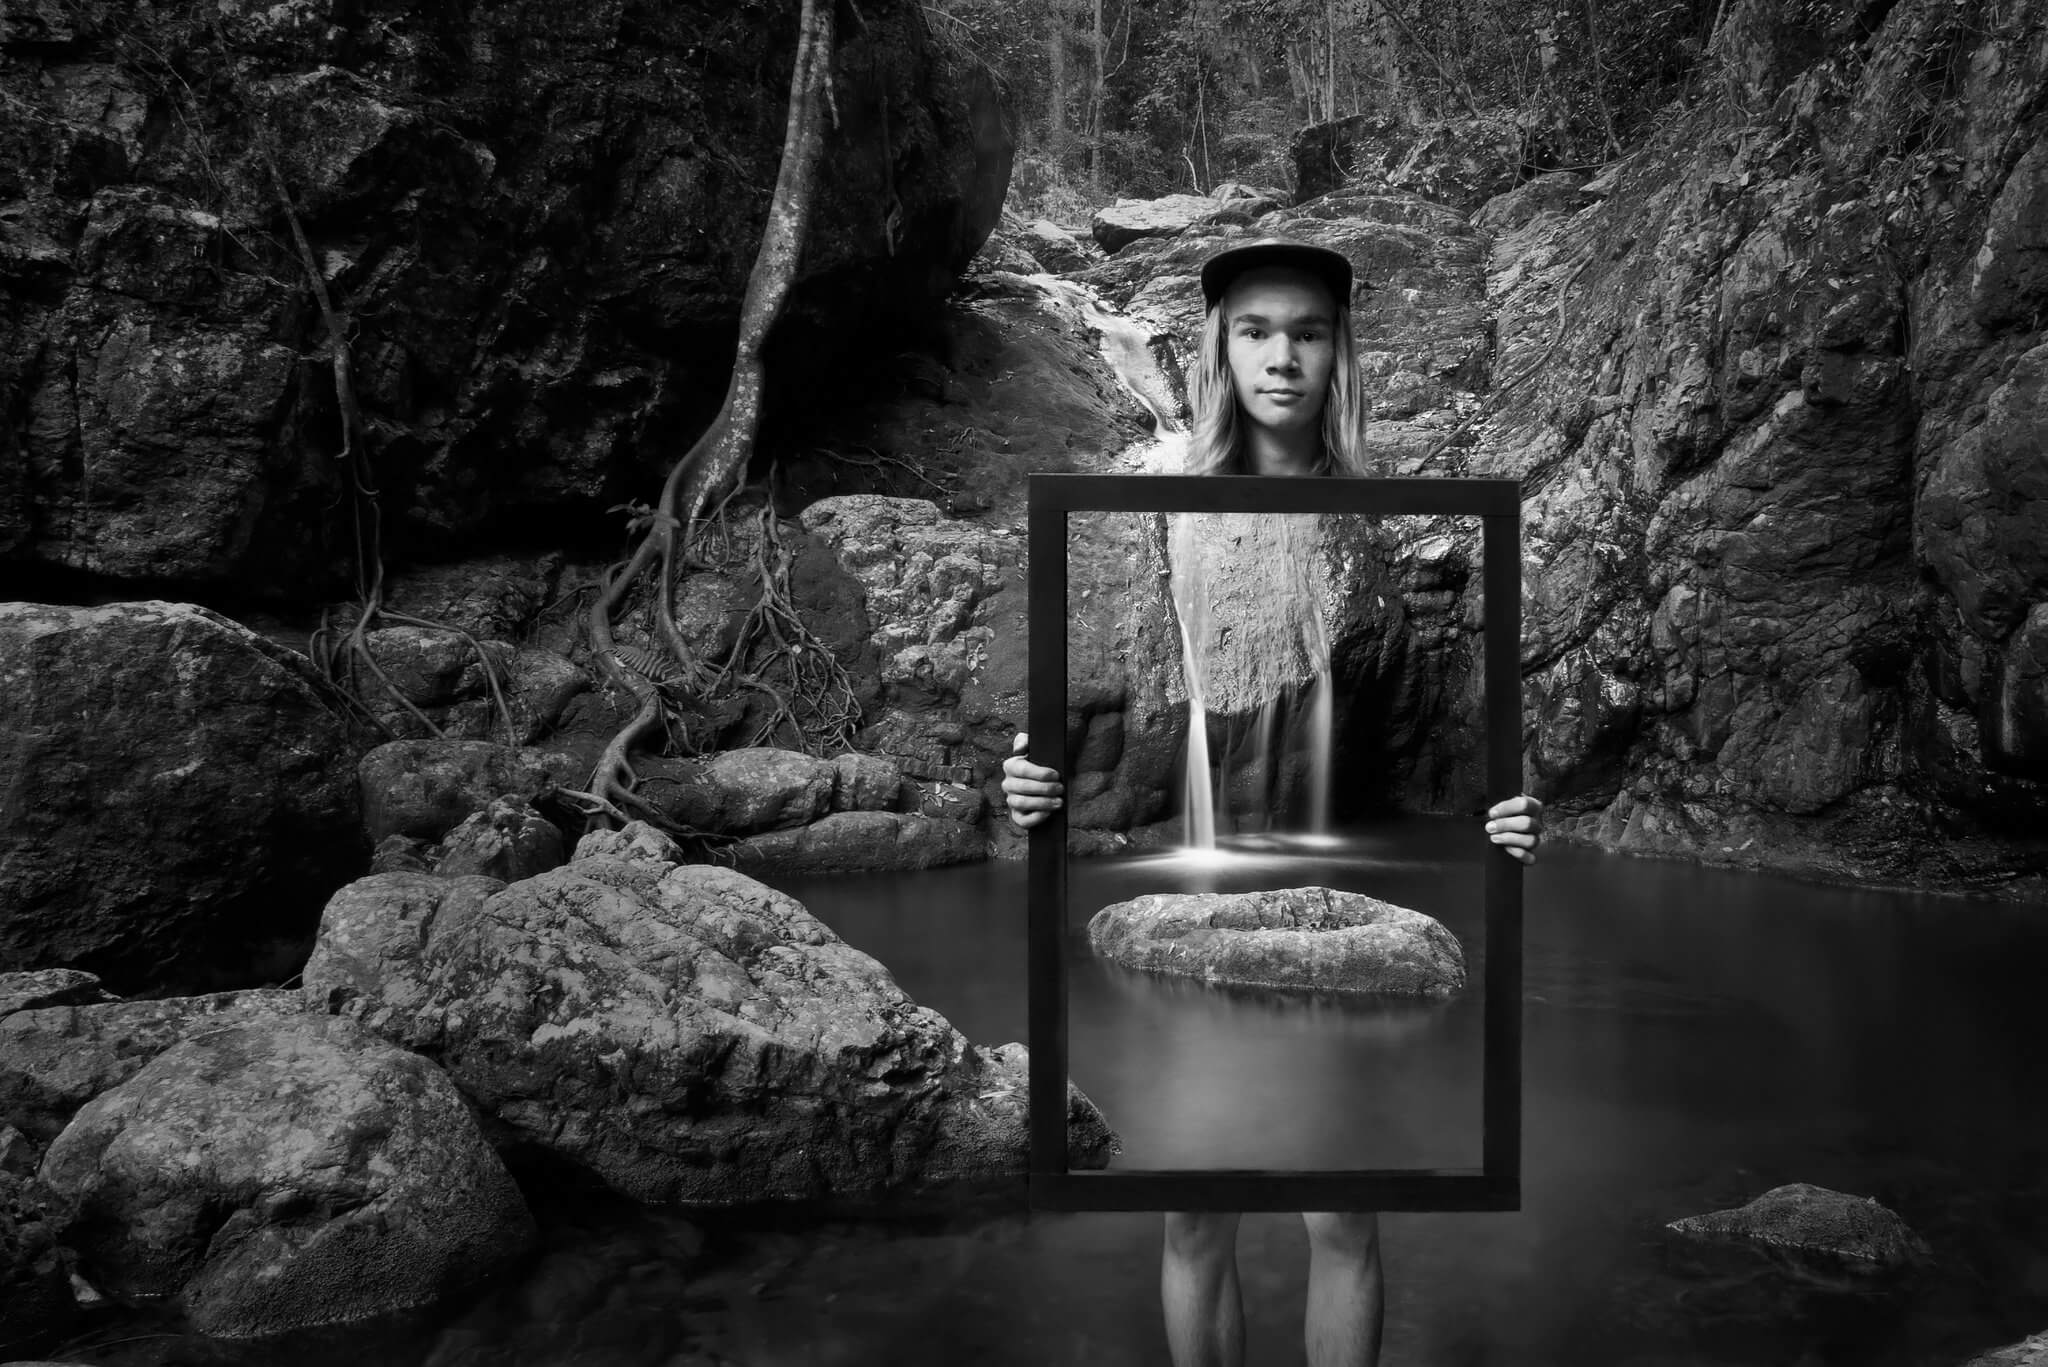 Roger Dautais: Efemer művészet, productionmyarts.com